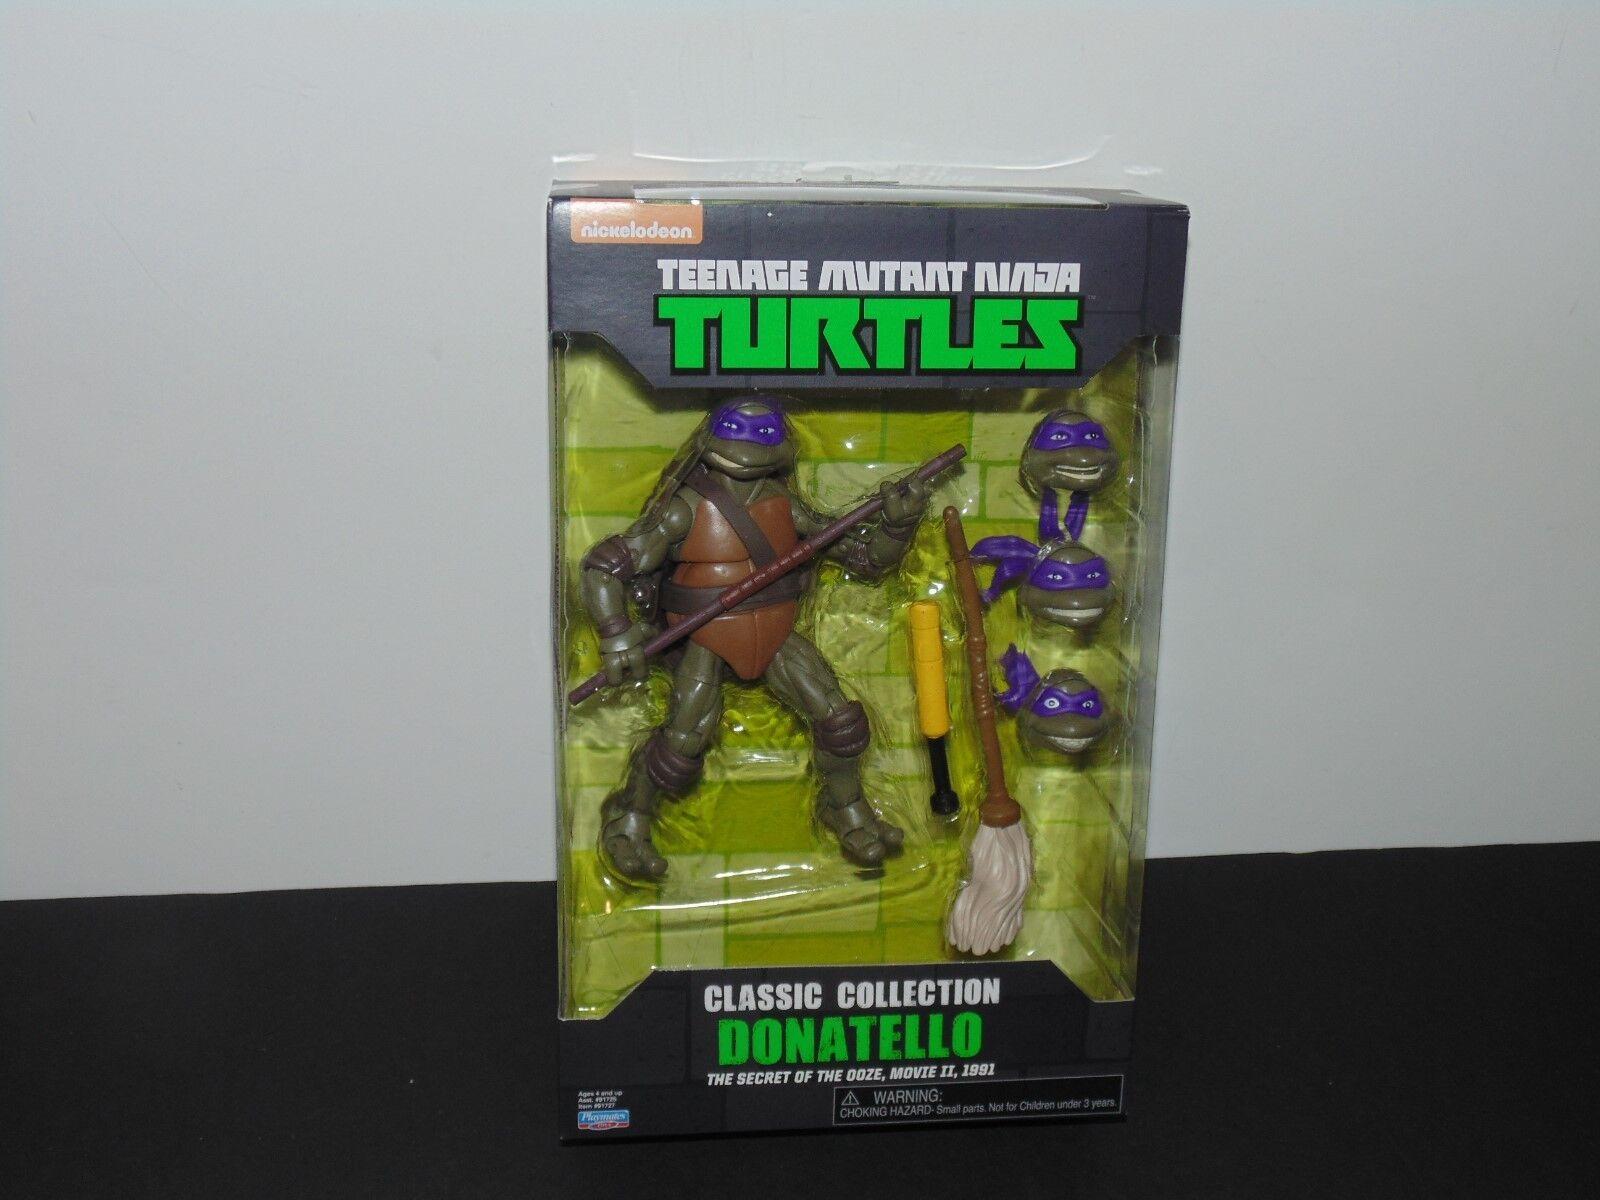 Teenage Mutant Ninja Turtles, Classic Collection - Donatello